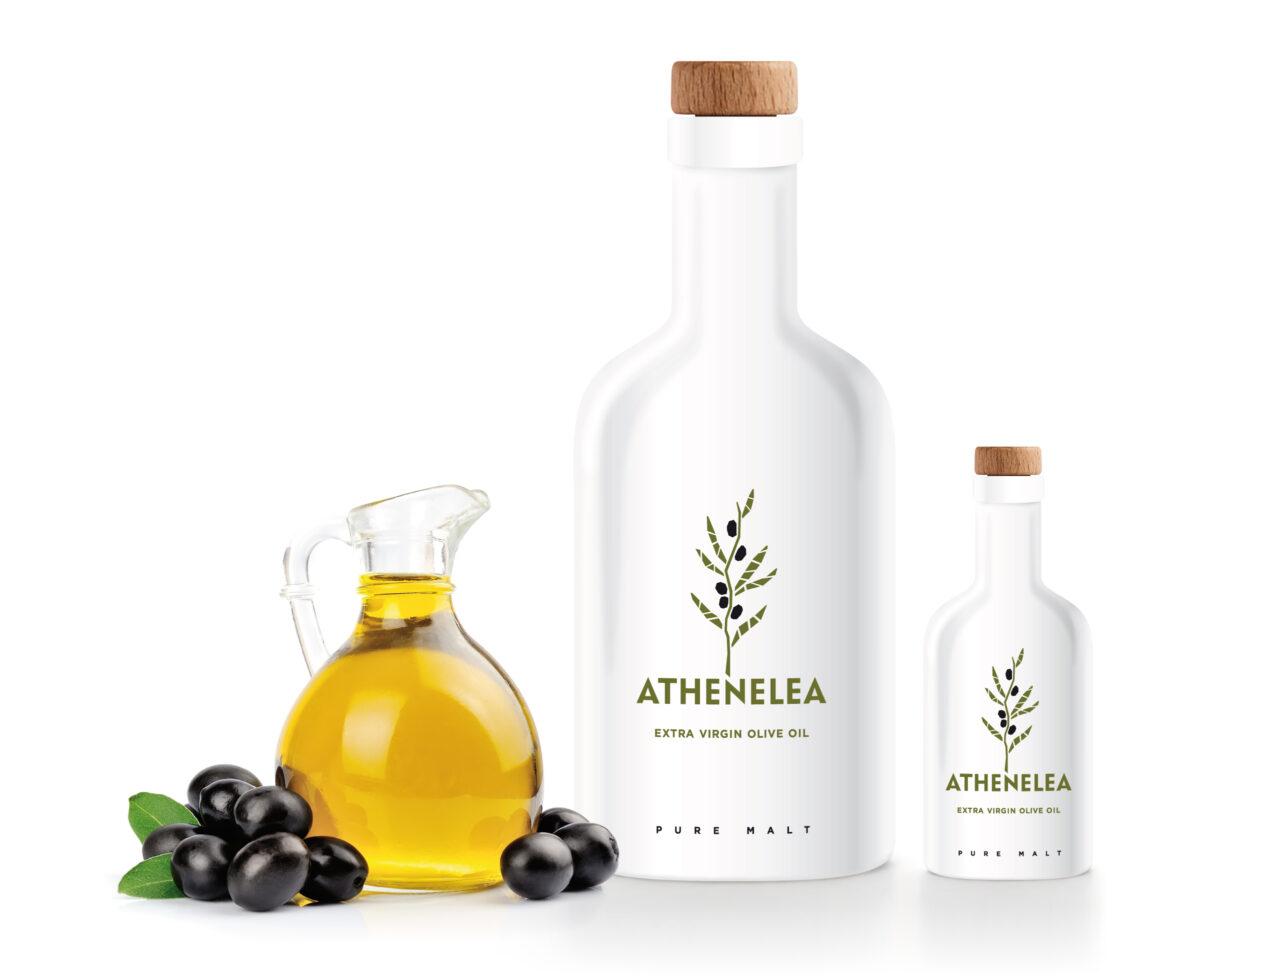 Athenelea extra virgin olive oil branding design